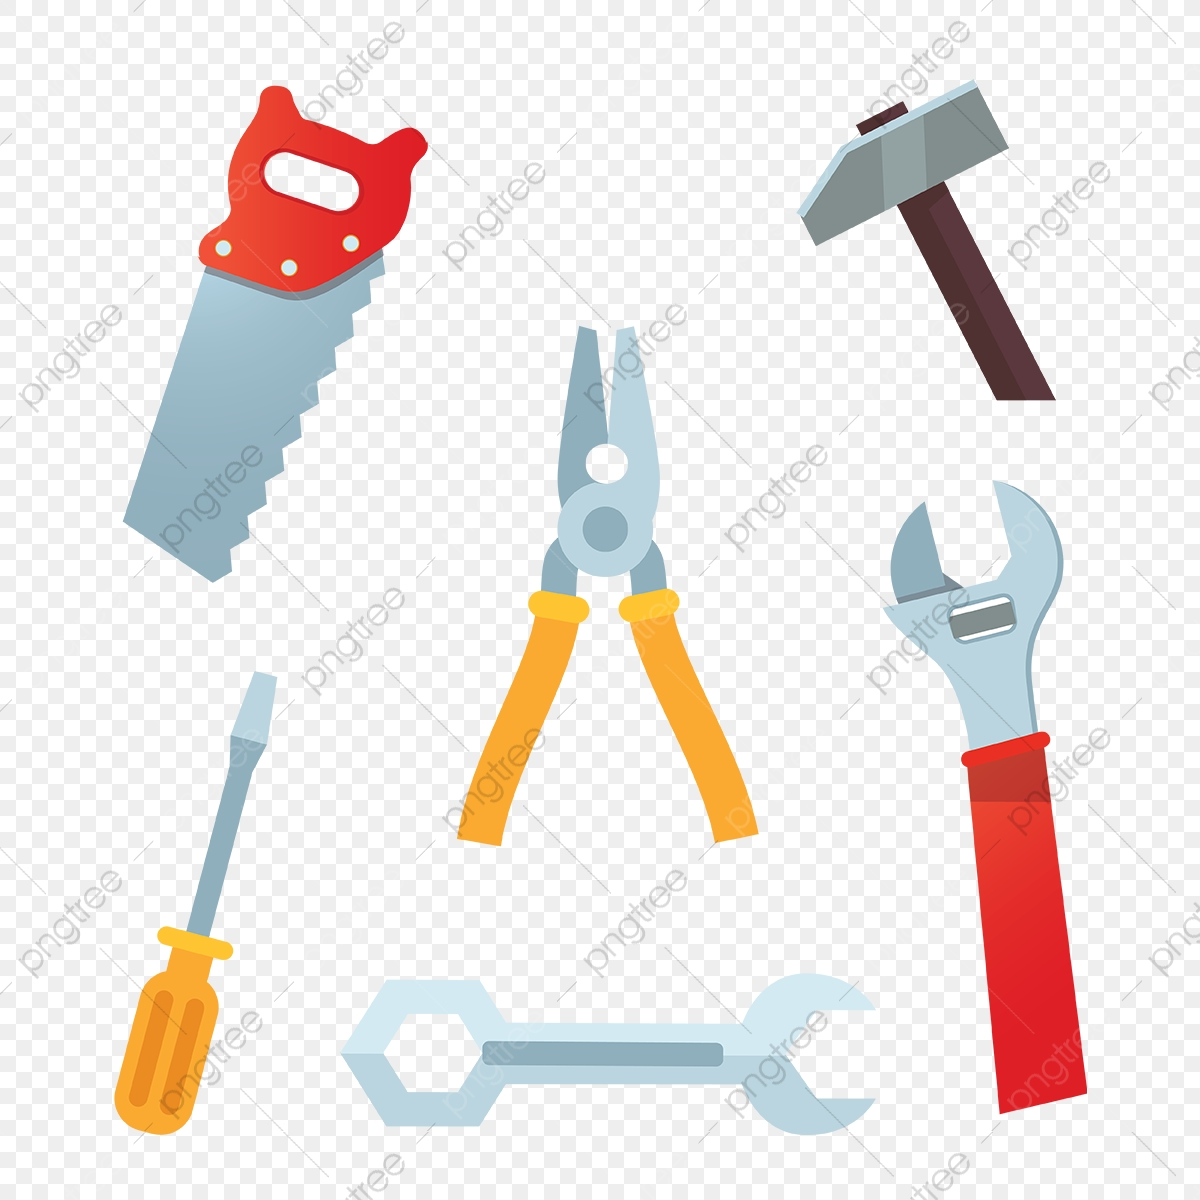 Tool clipart herramientas. Carpenter tools png